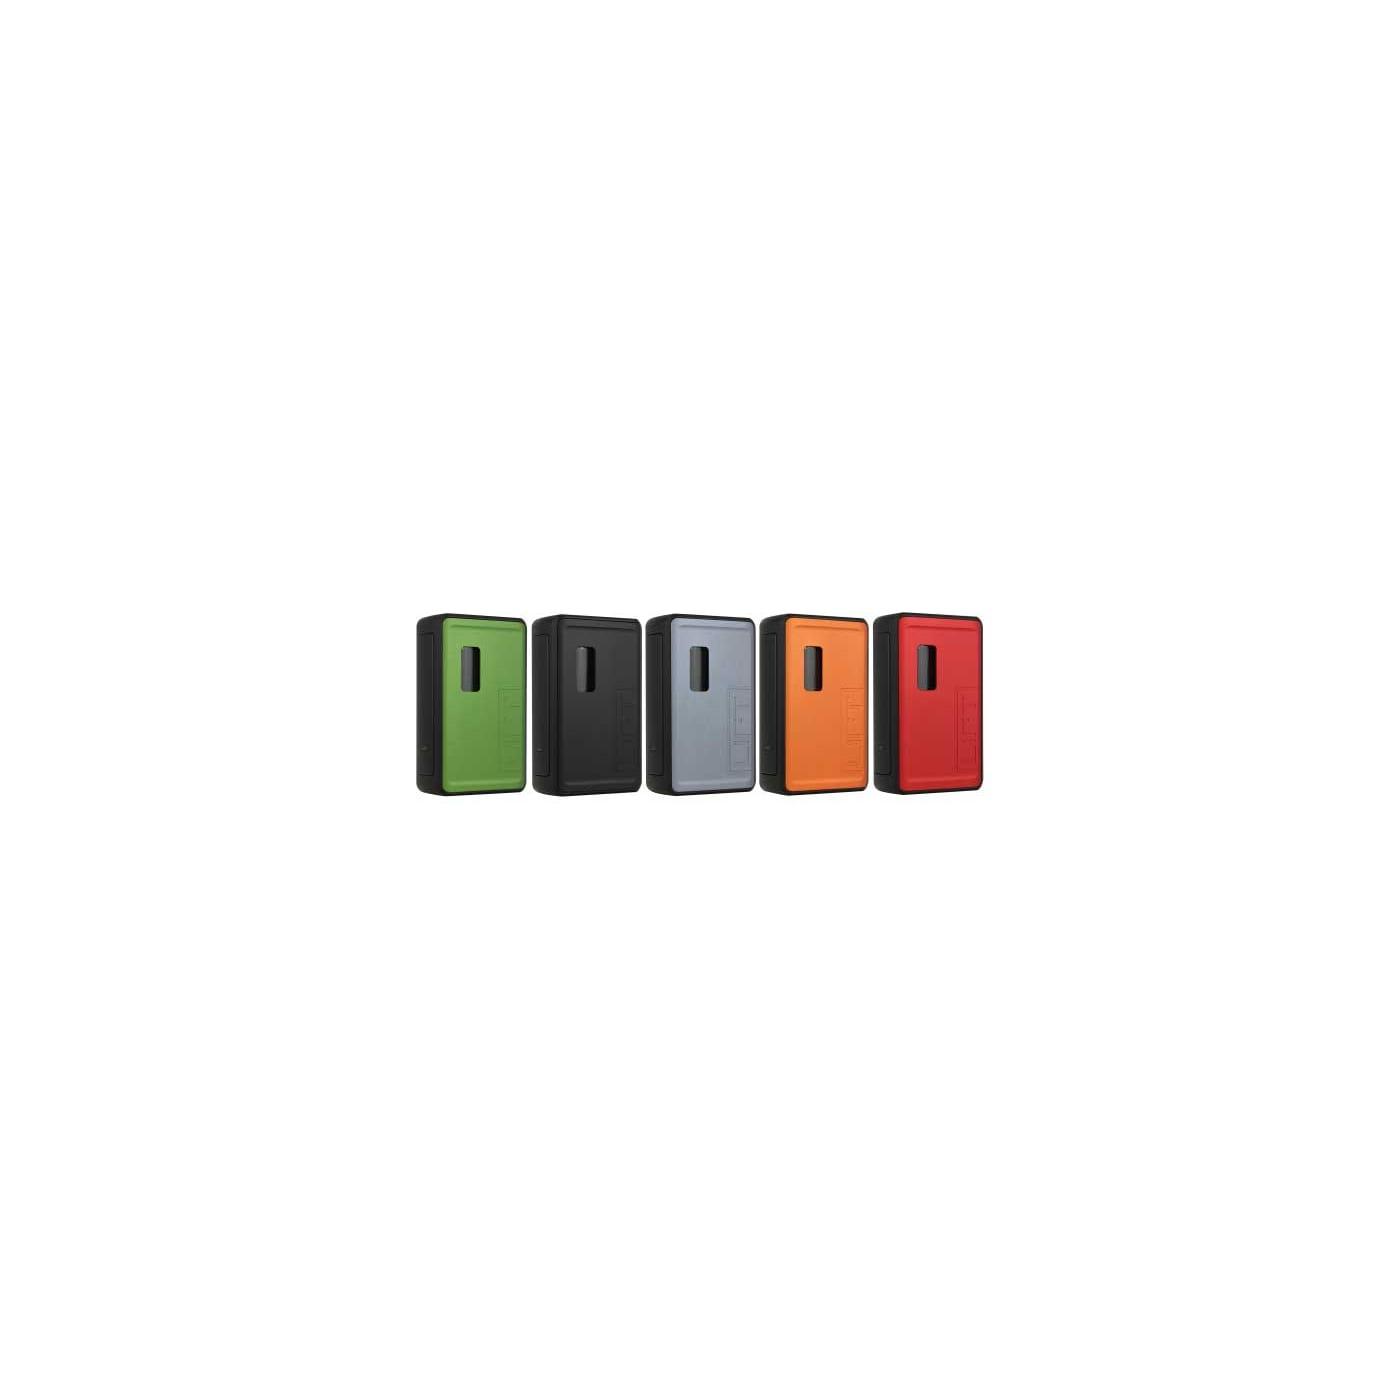 Innokin Liftbox Bastion Express Kit